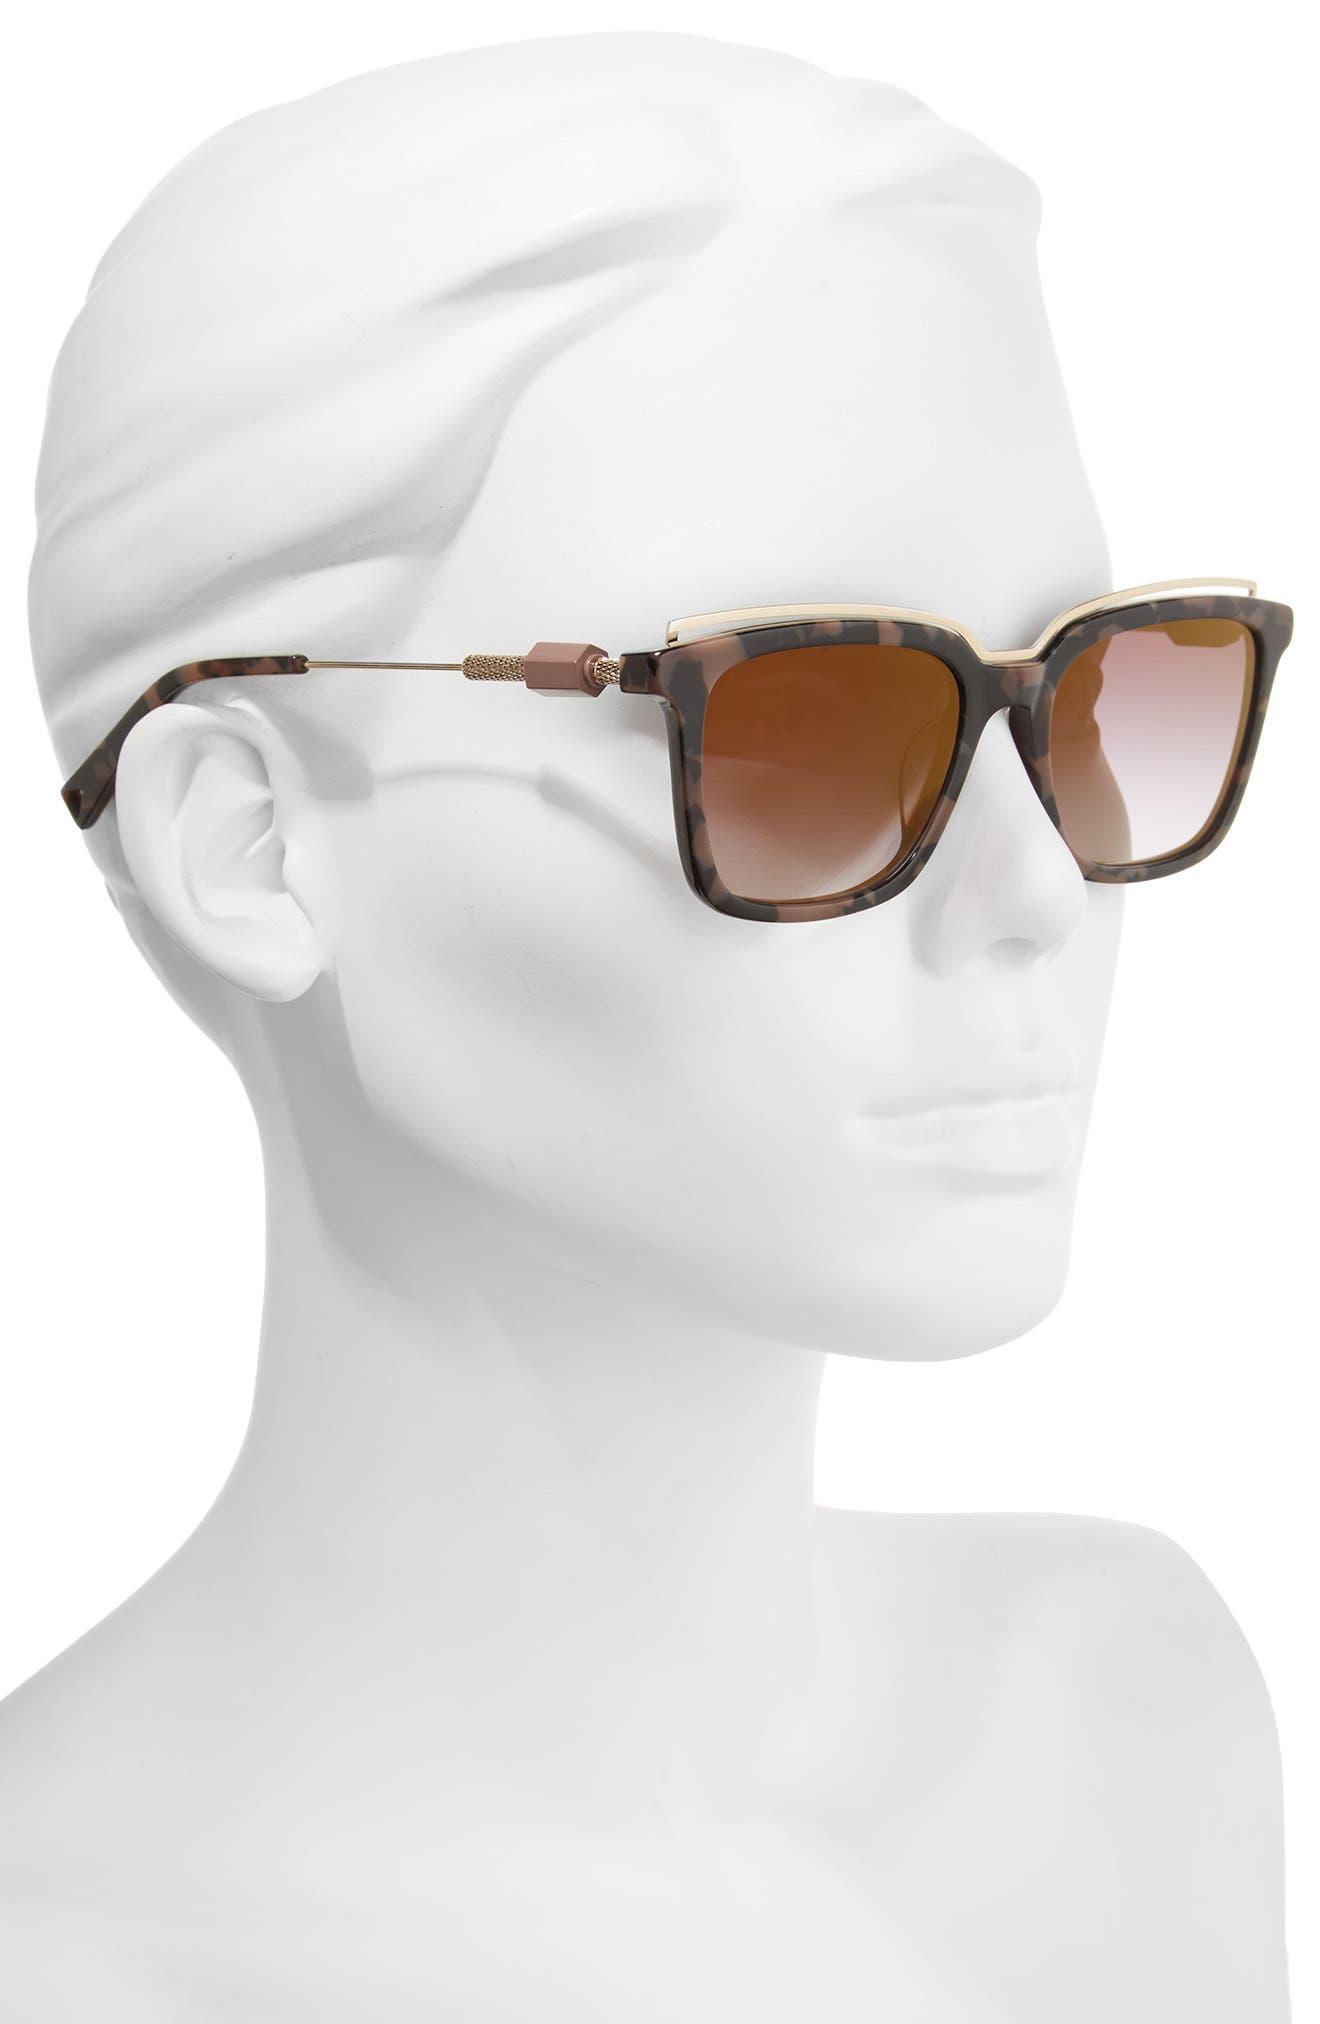 Opus 54mm Sunglasses,                             Alternate thumbnail 5, color,